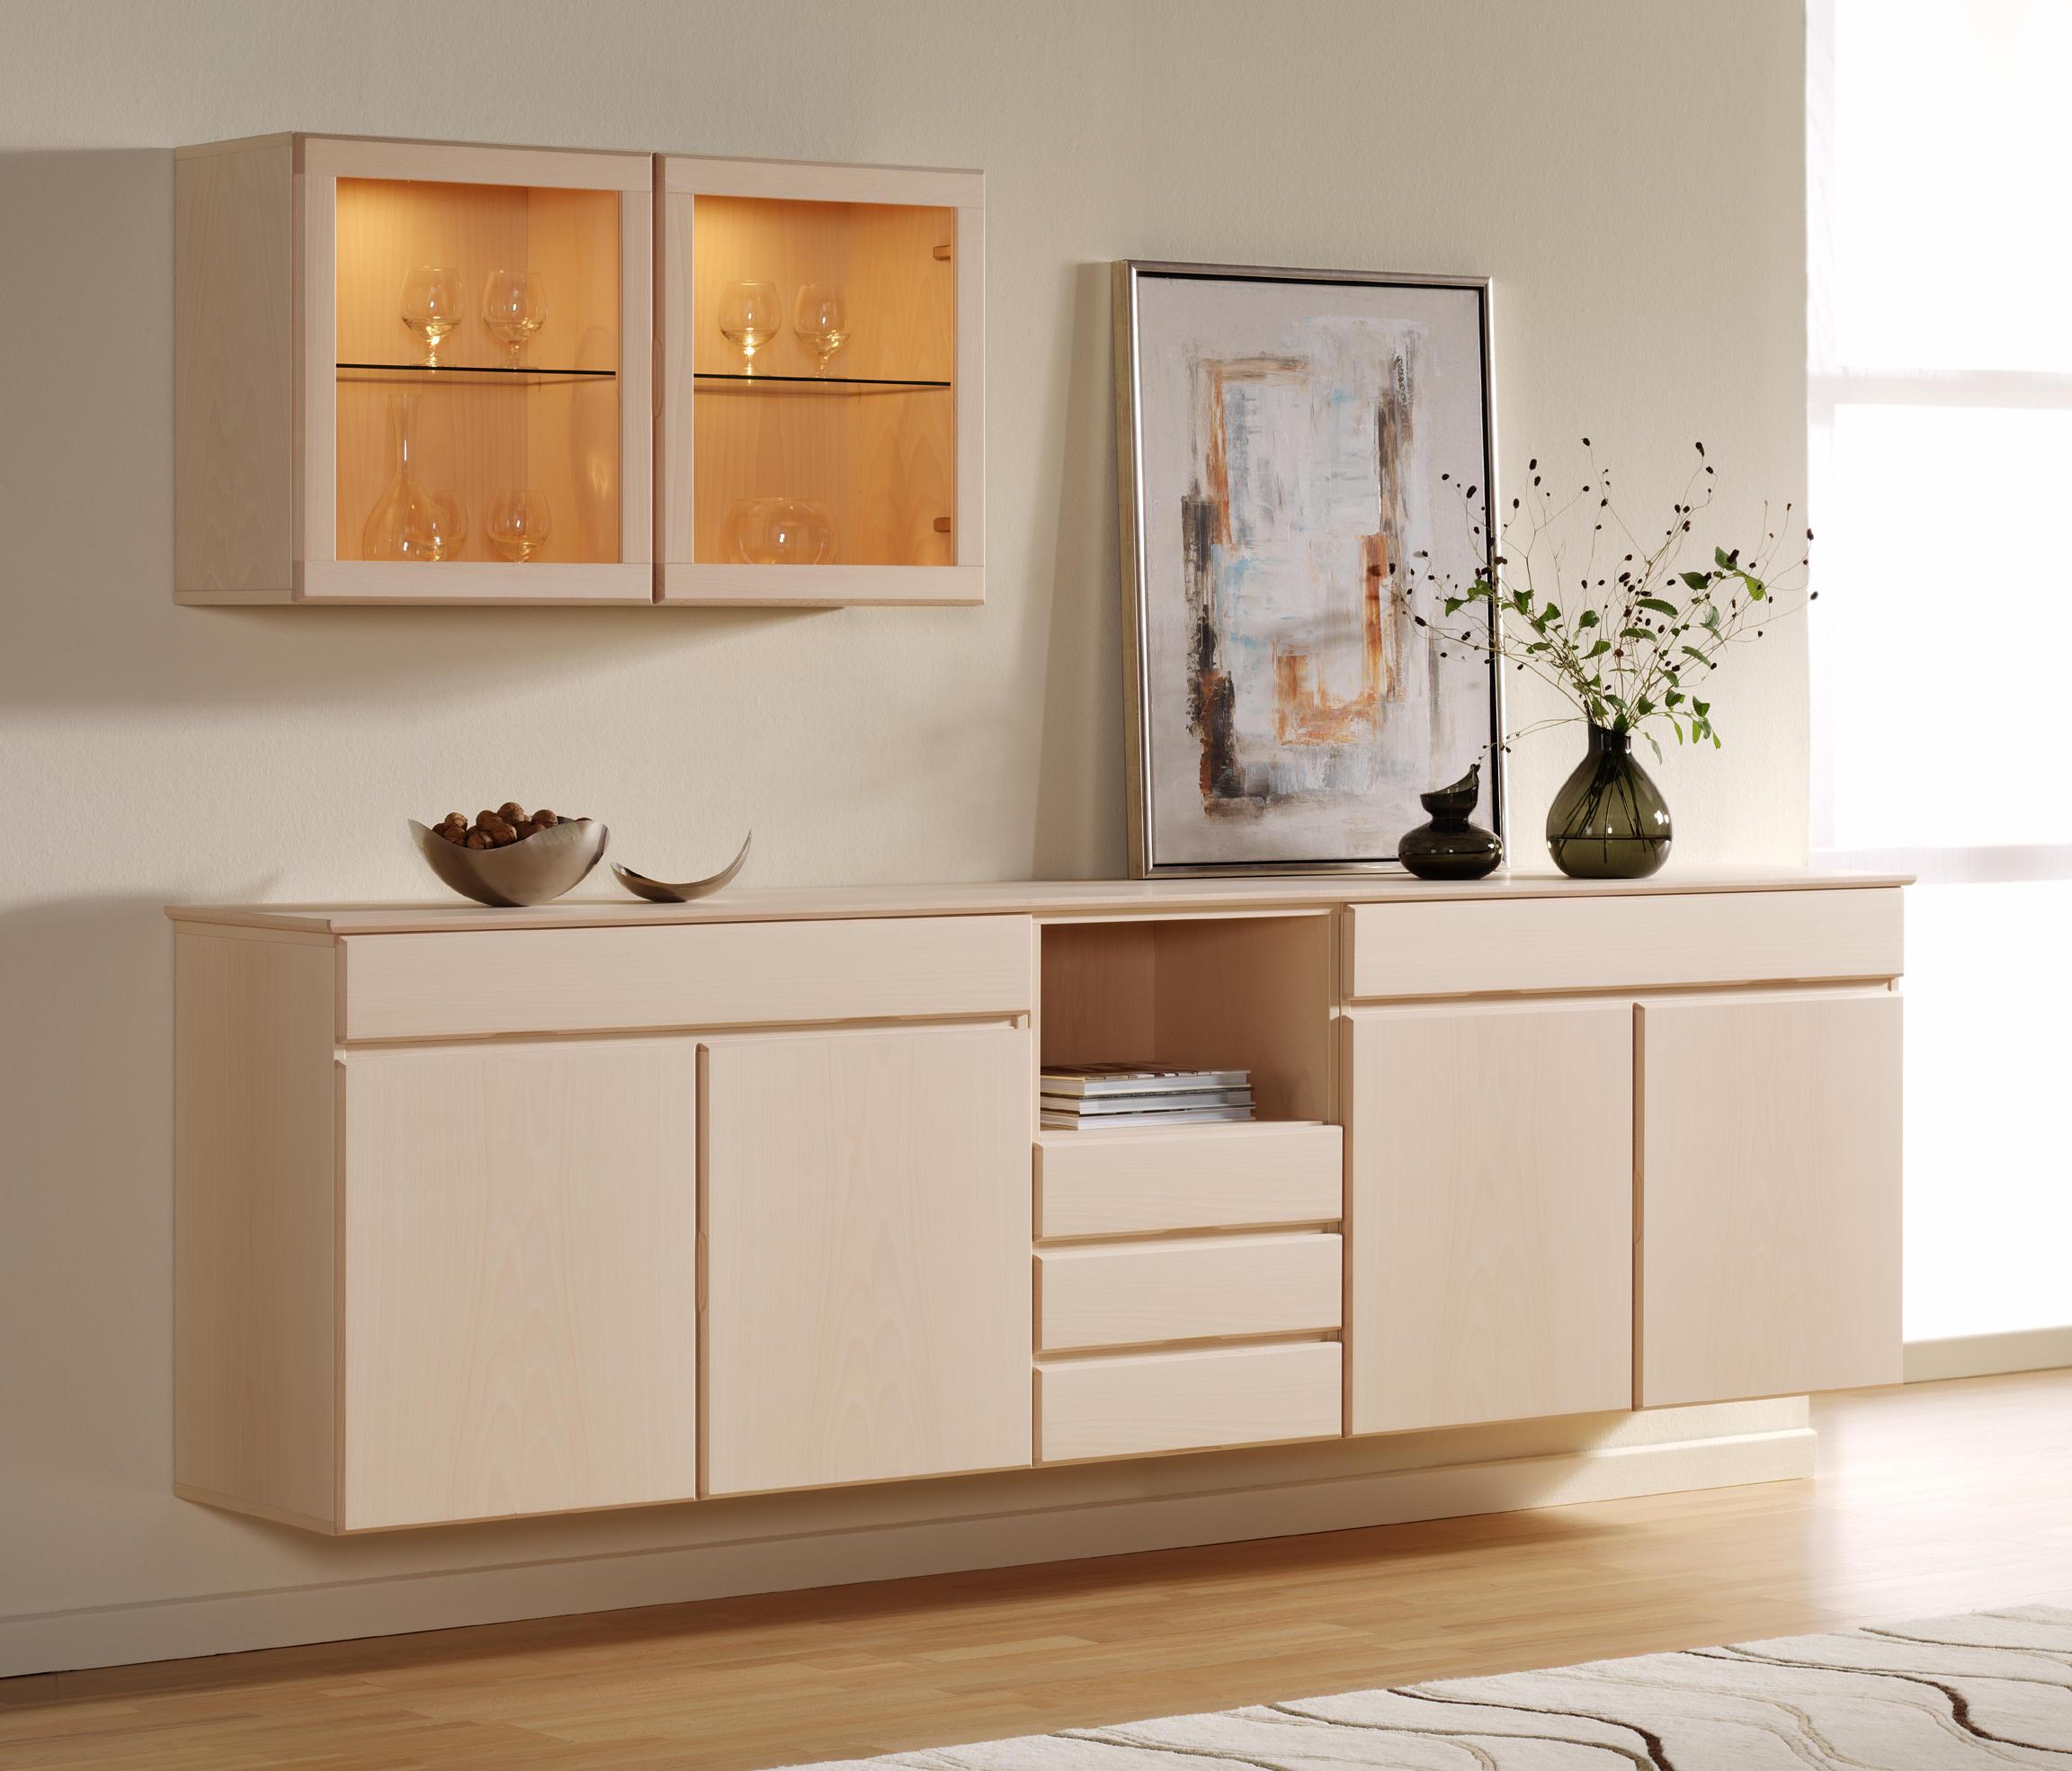 KLIM Cabinet System 2012 By